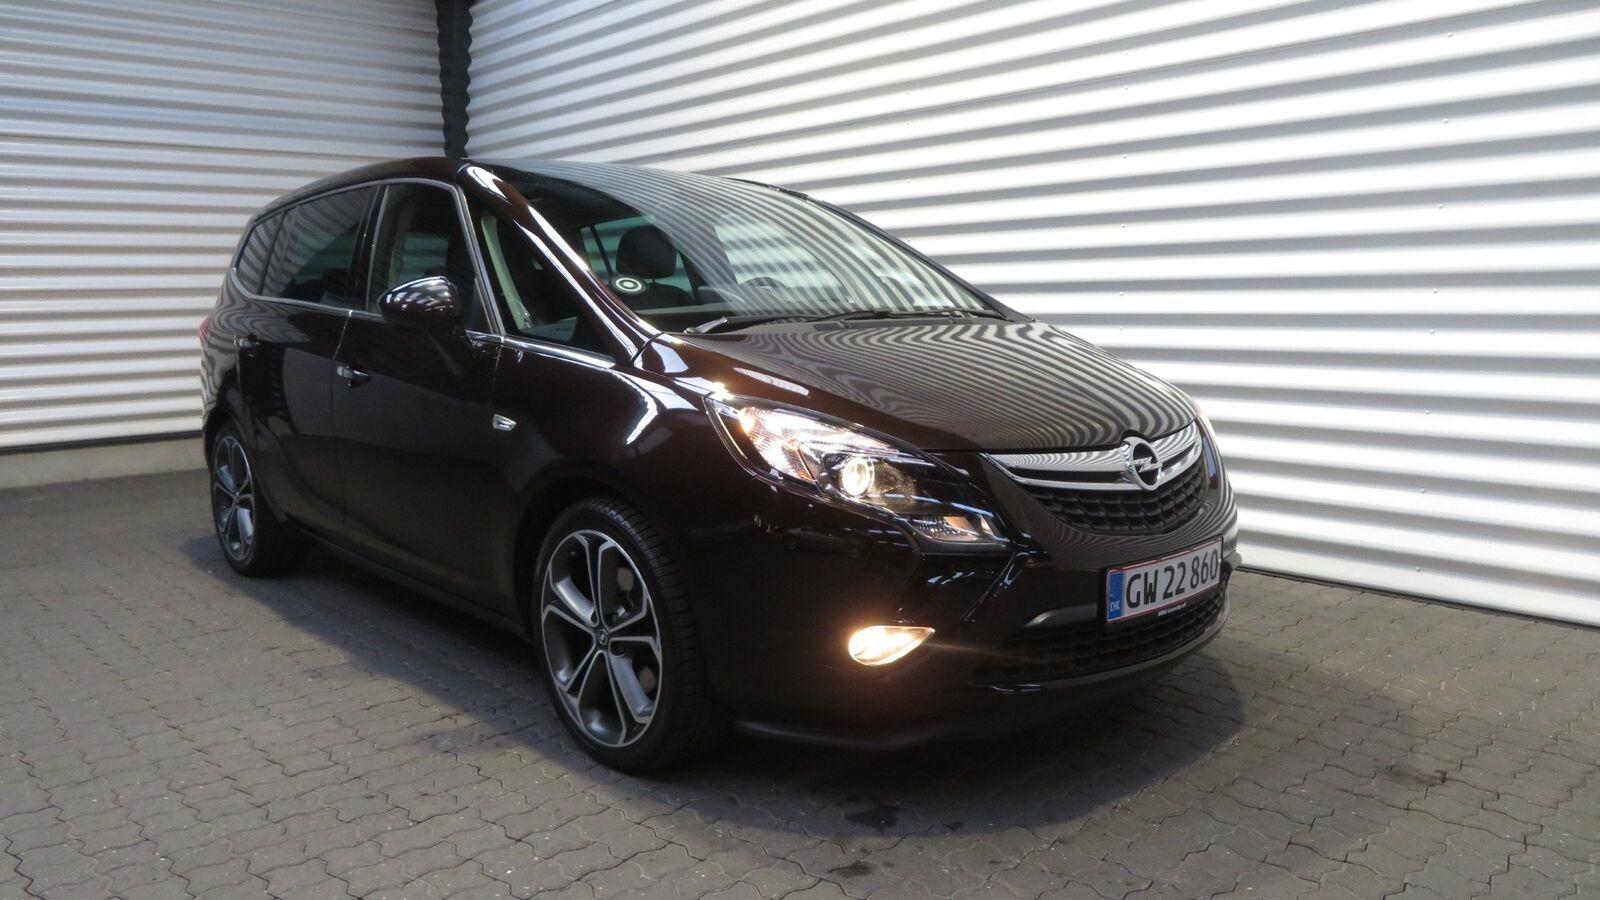 Opel Zafira Tourer 2,0 CDTi 165 Cosmo aut. 5d